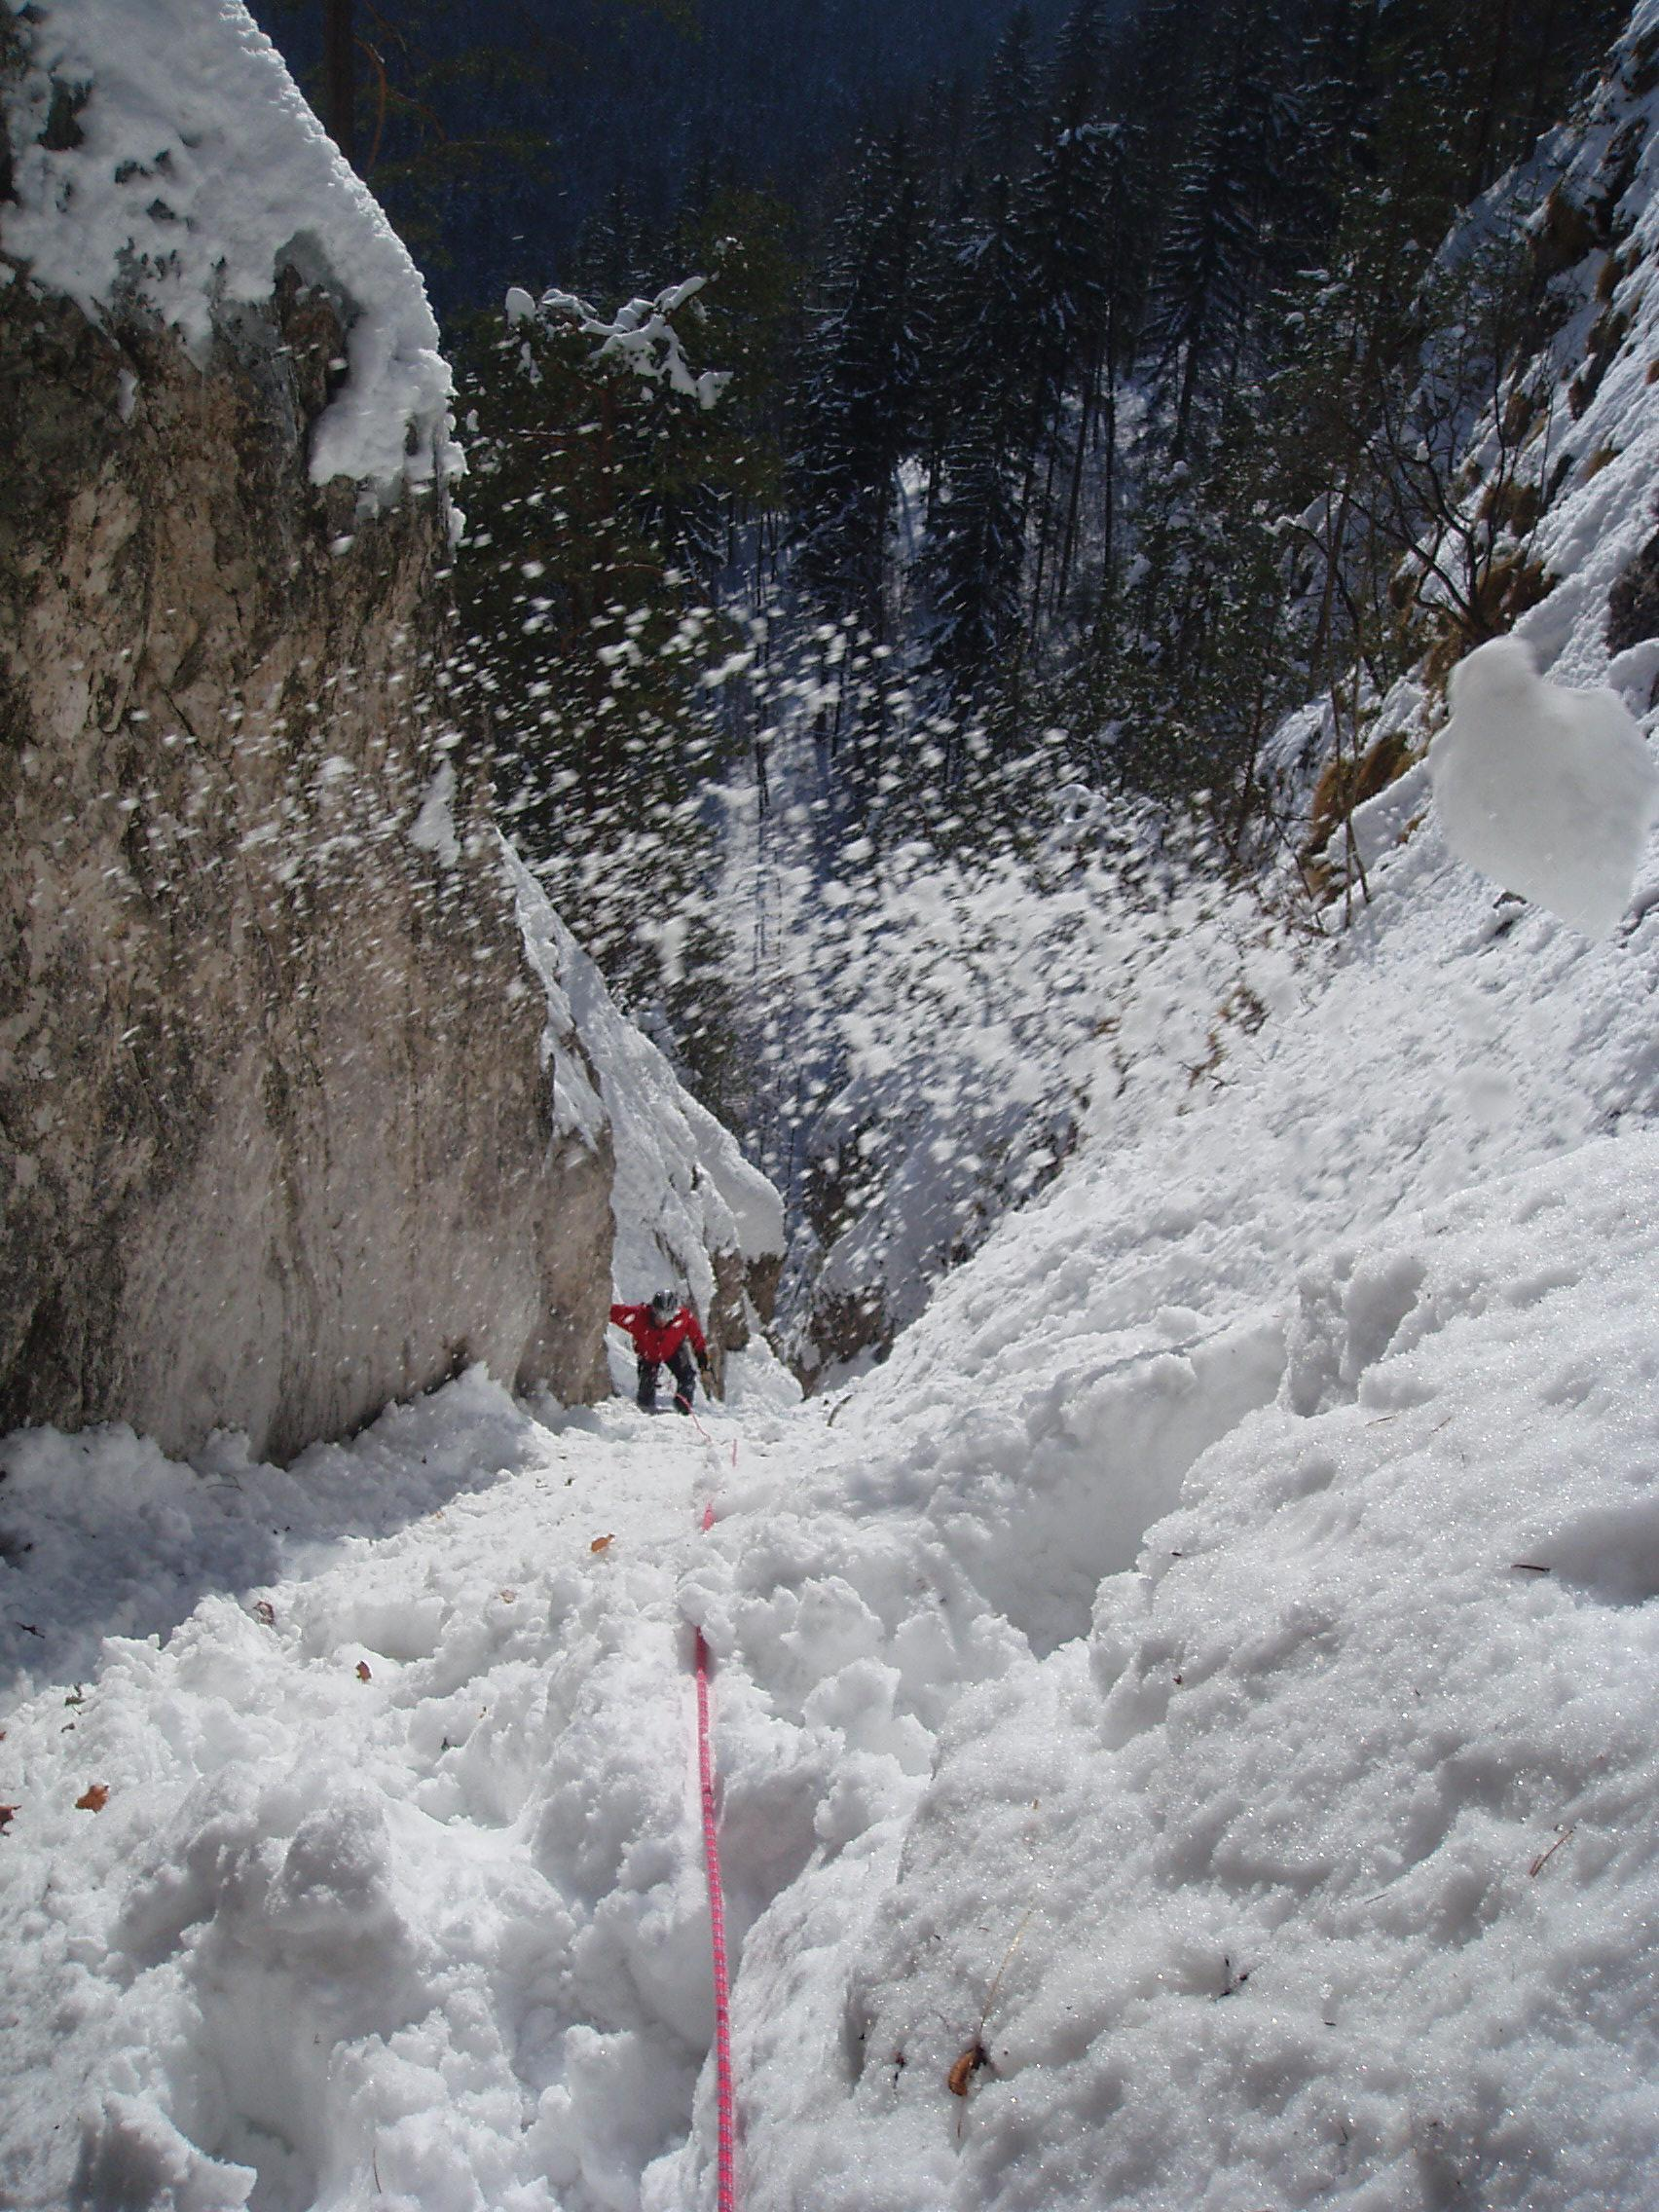 Po Matjažu pada sneg :)